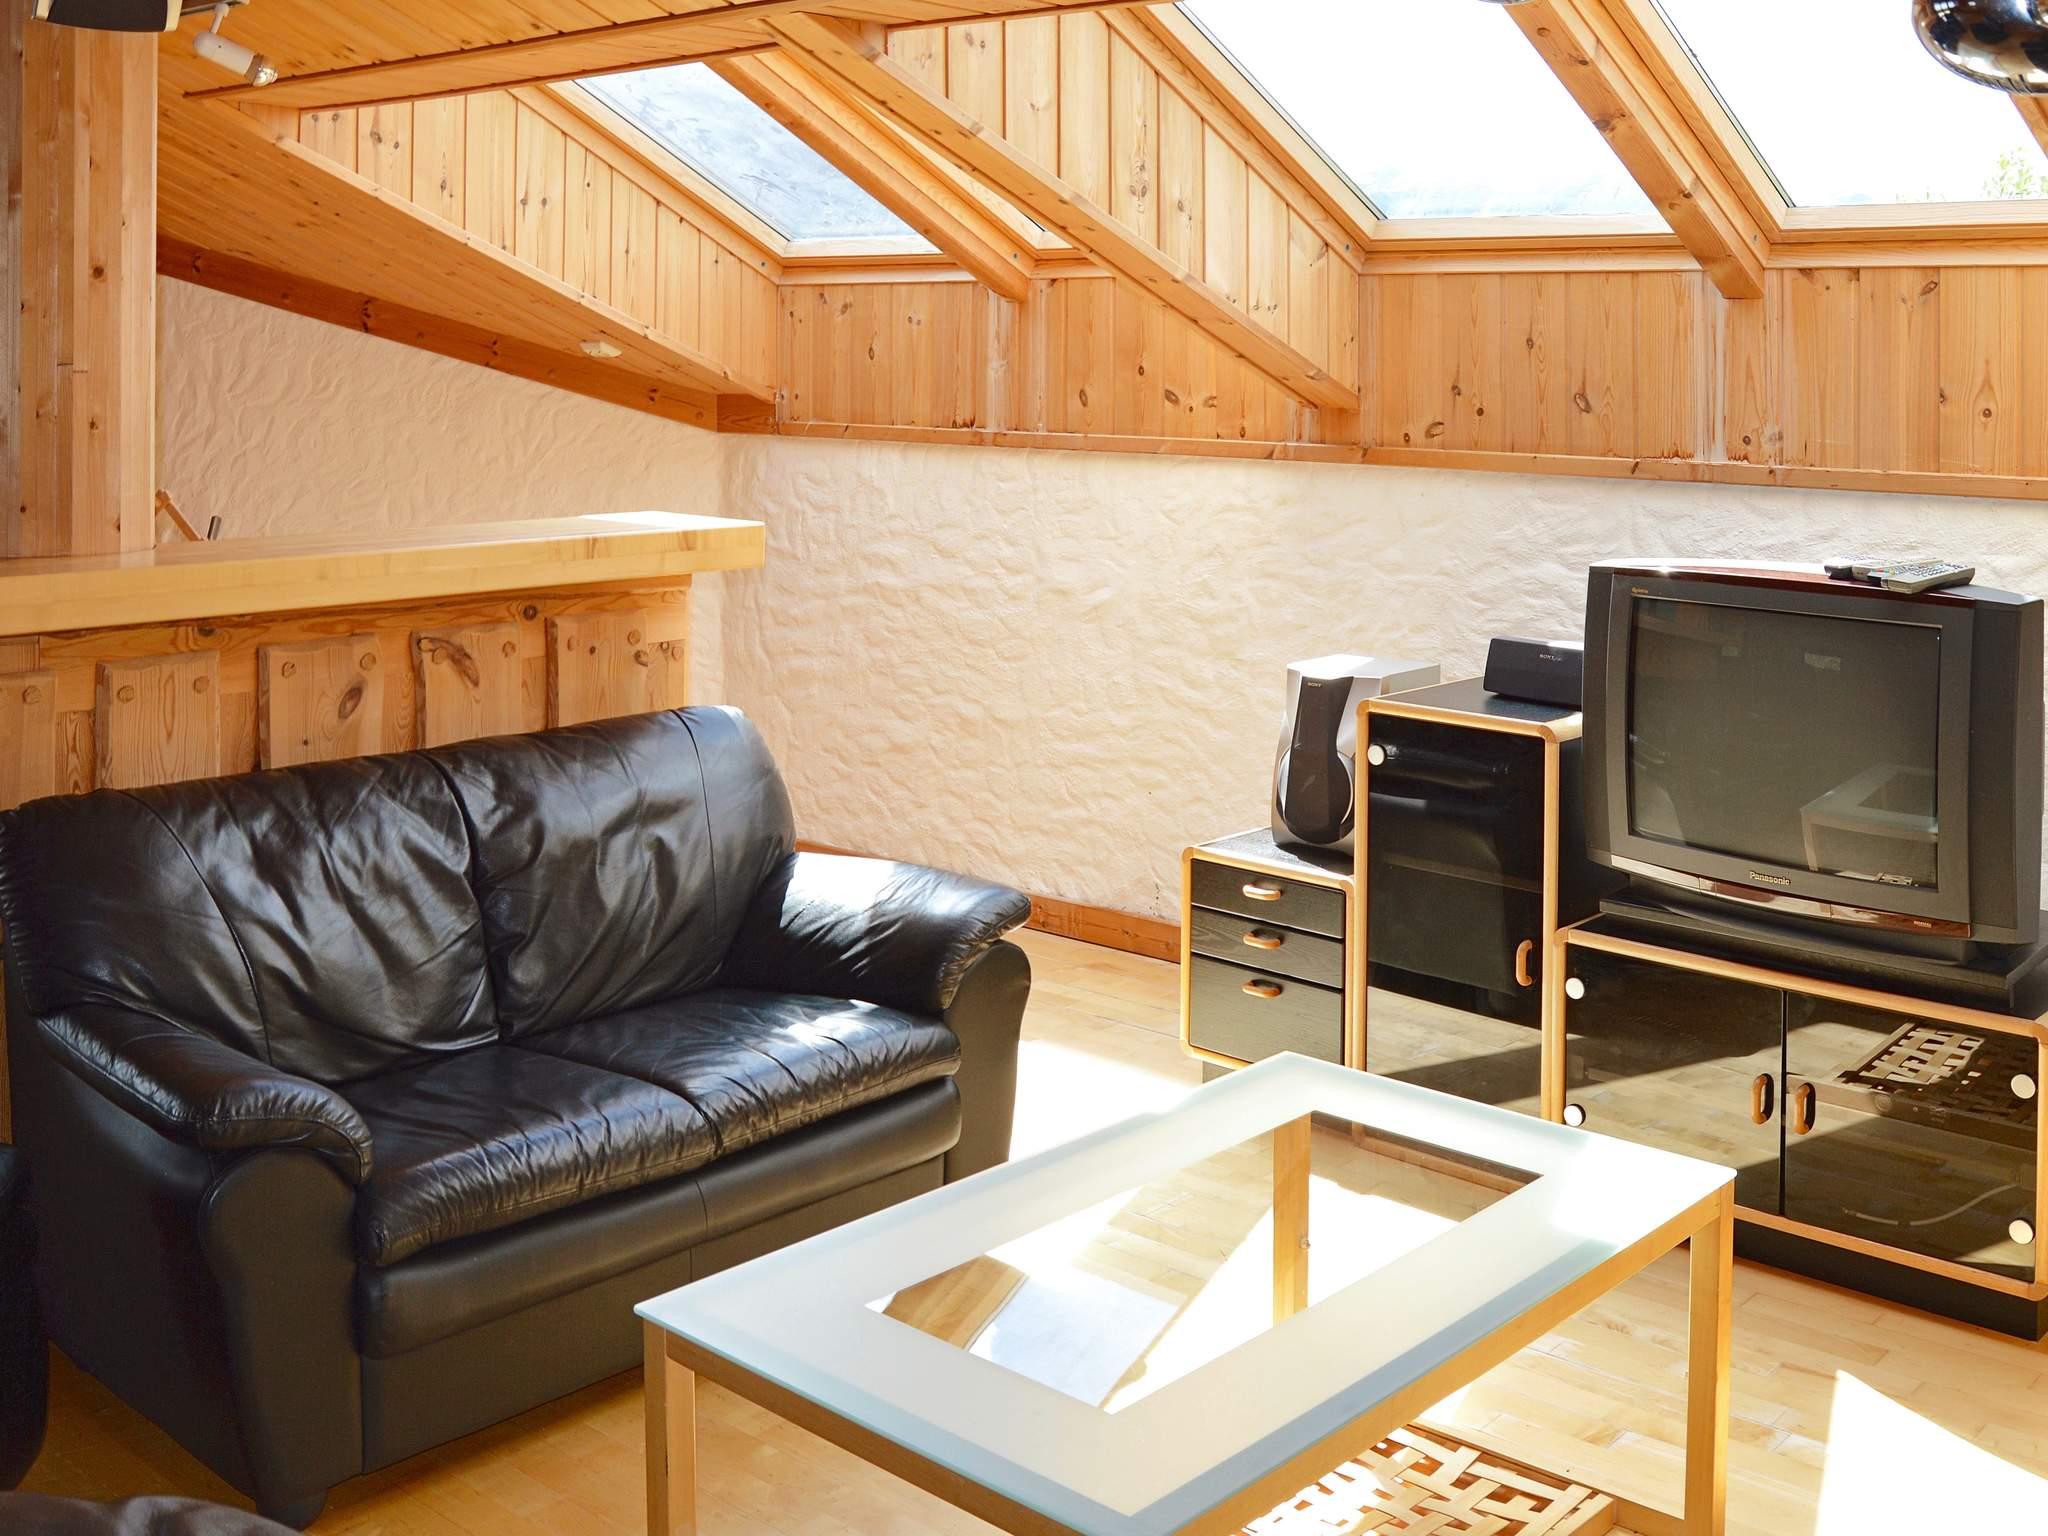 Ferienhaus Eidsvåg (84695), Eidsvåg, More - Romsdal, Westnorwegen, Norwegen, Bild 8